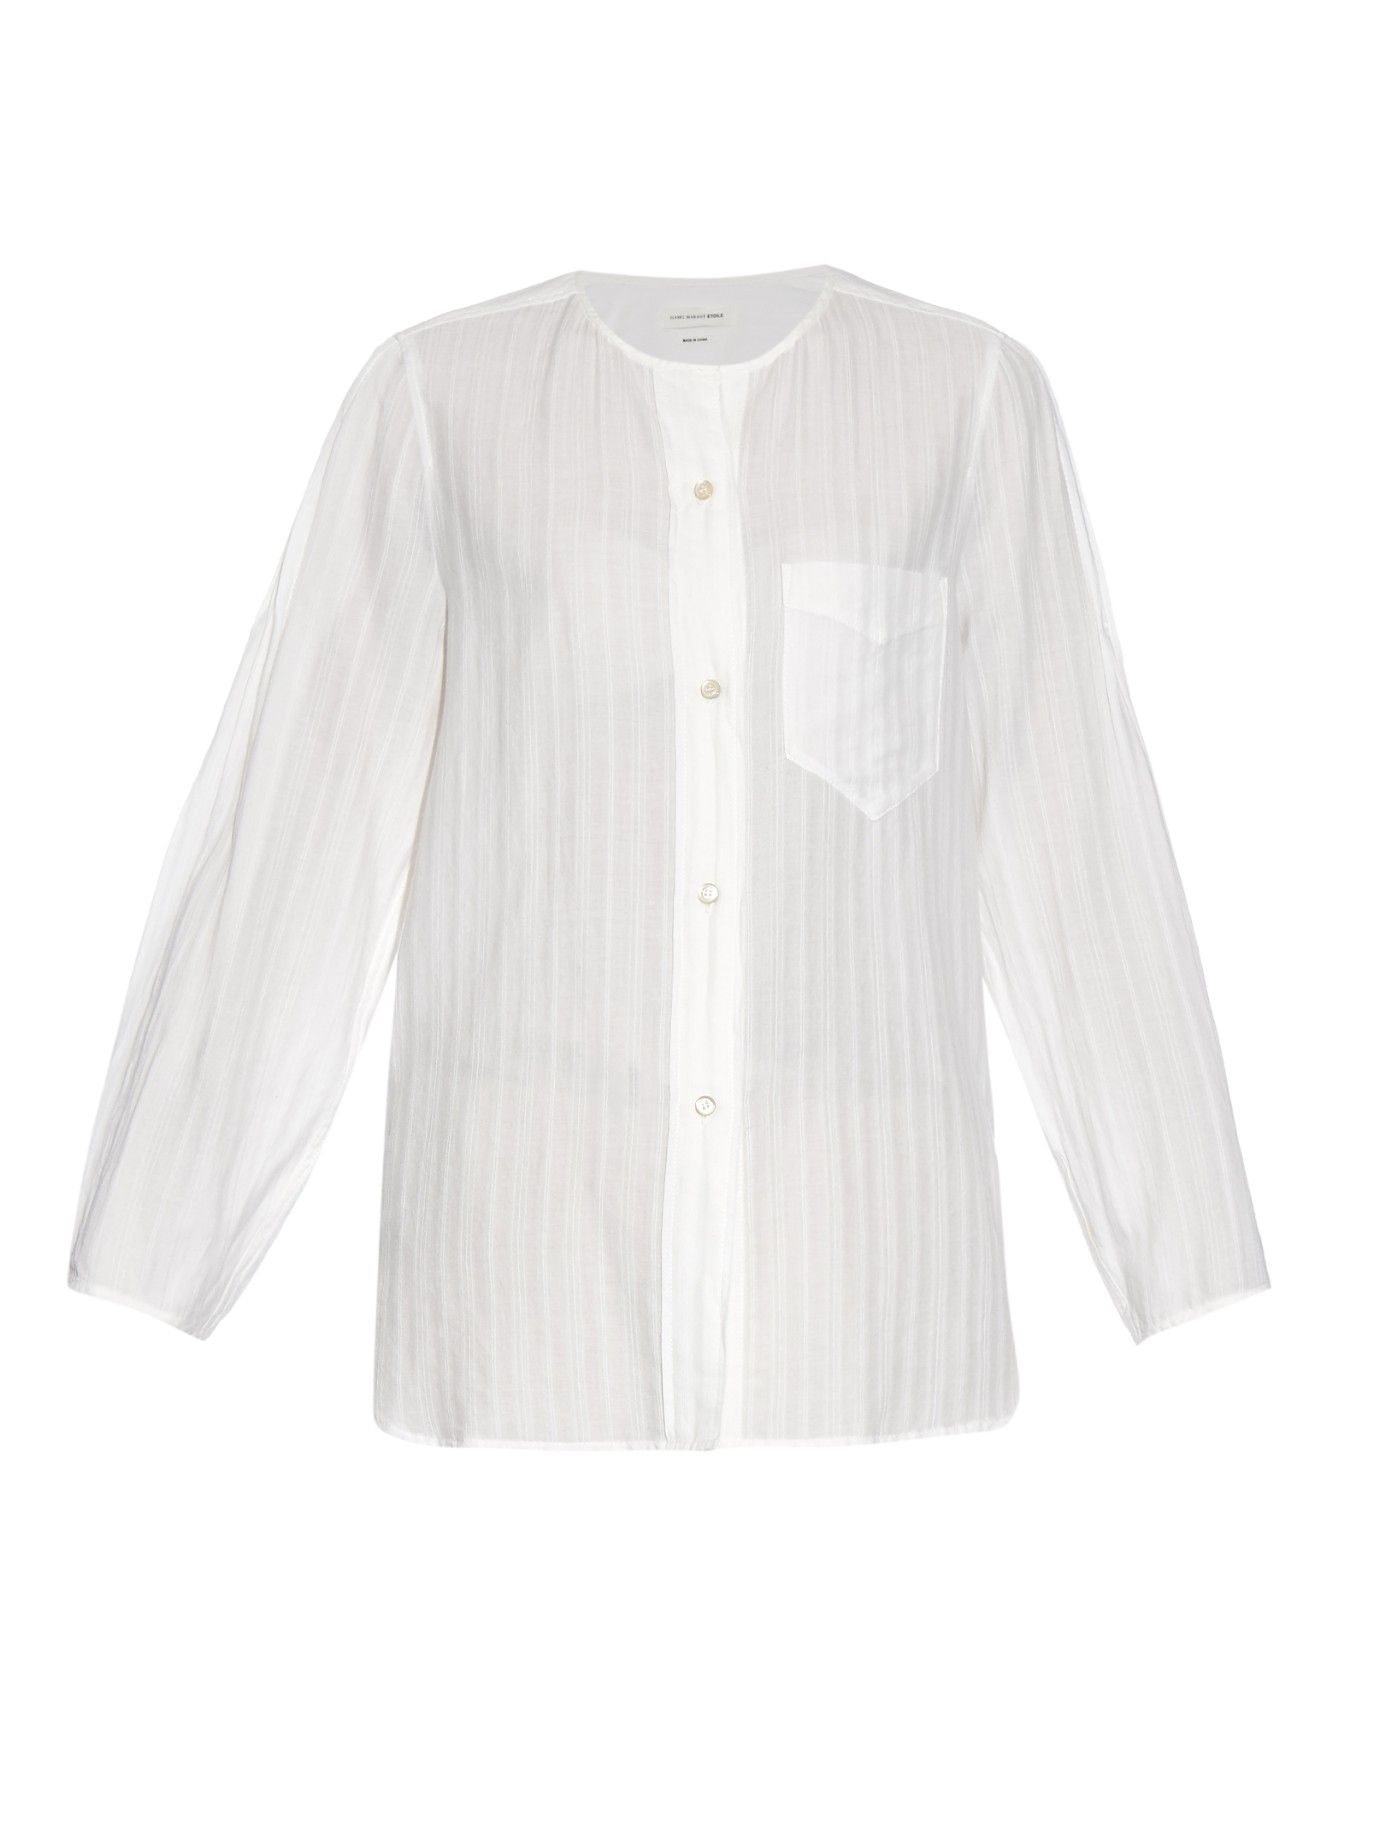 Nell pinstripe cotton-blend shirt | Isabel Marant Étoile | MATCHESFASHION.COM AU #stylingmrsoliver.com